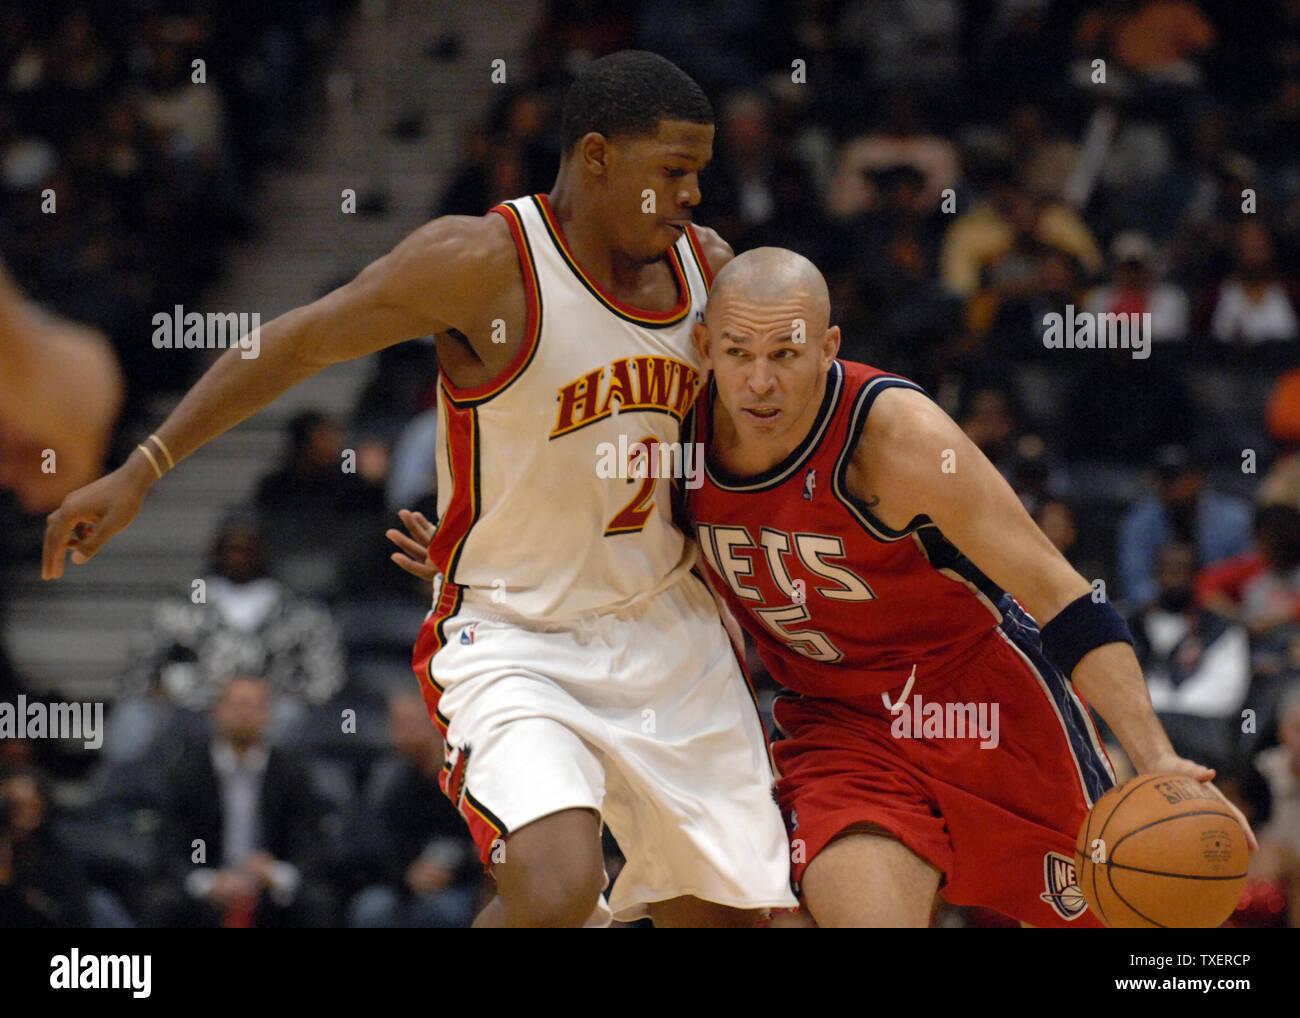 online store 47d67 9e137 New Jersey Nets Jason Kidd (5) drives against Atlanta Hawks ...